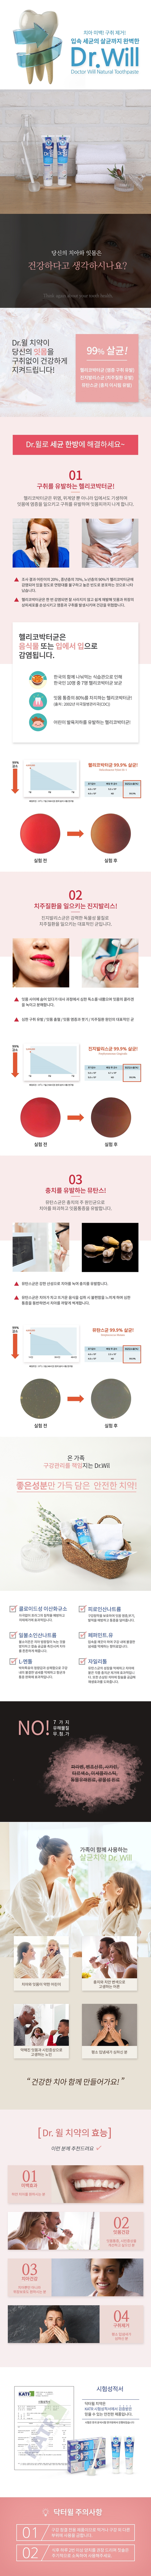 190430_%EB%8B%A5%ED%84%B0%EC%9C%8C%EC%B9%98%EC%95%BD_%ED%95%9C%EA%B8%80.jpg